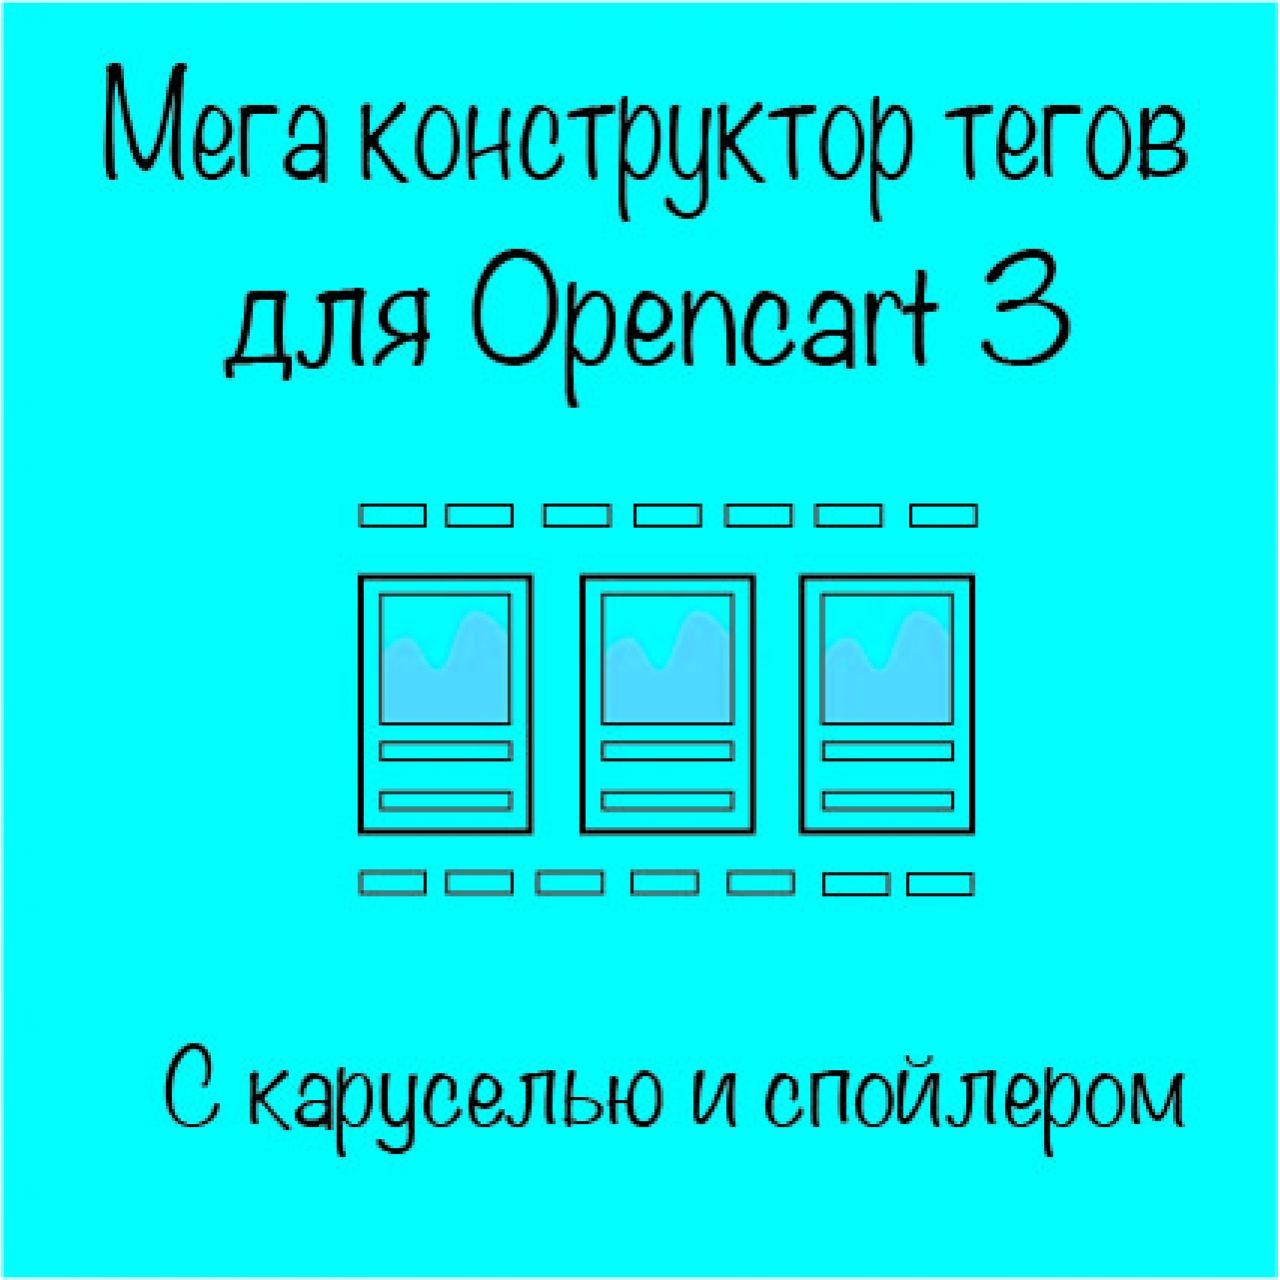 Мега конструктор тегов Opencart 3 из категории SEO для CMS OpenCart (ОпенКарт)